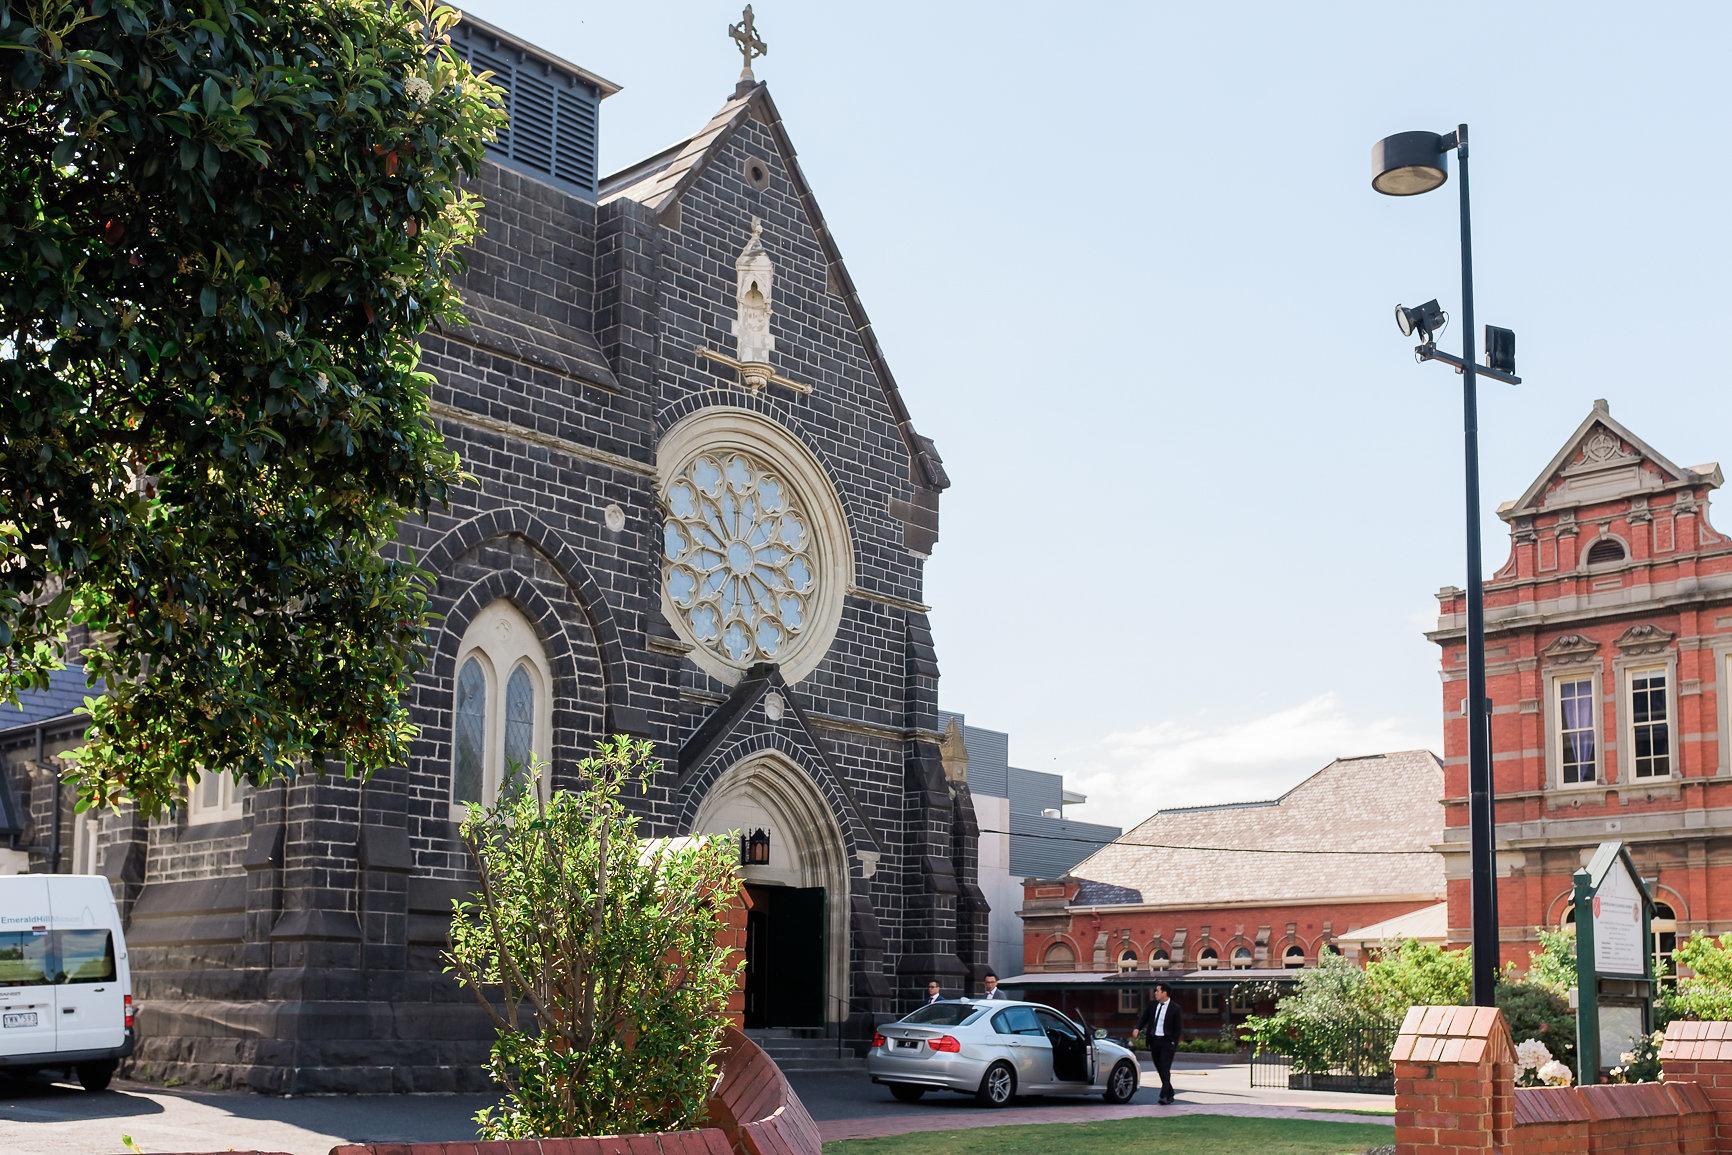 Sydney Wedding Photography Vines Helen's Hill Restaurant  St Peter and Paul's Church - 0115.jpg